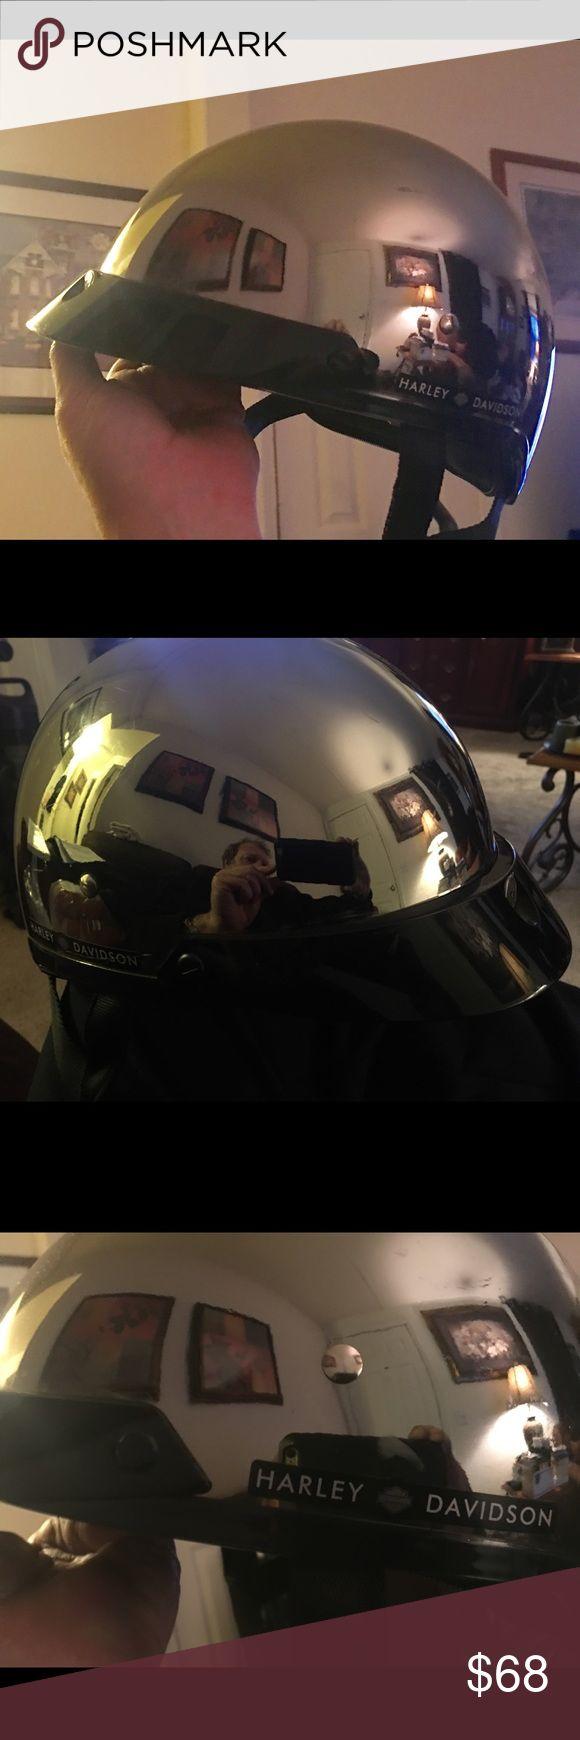 Harley Davidson Silver Half Helmet Harley Davidson Silver half helmet. Size Medium. Harley-Davidson Other